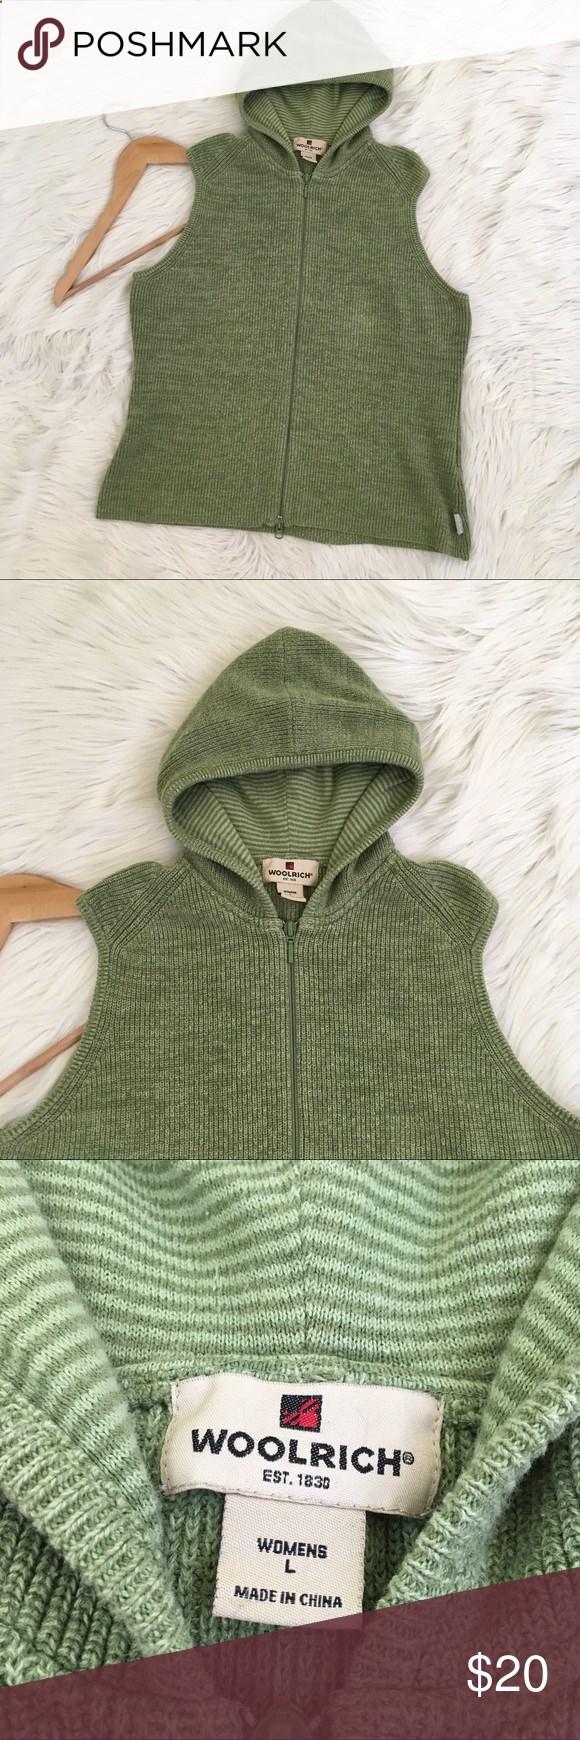 Woolrich Green Sleeveless Hooded Sweater Vest Woolrich Women's Sz ...